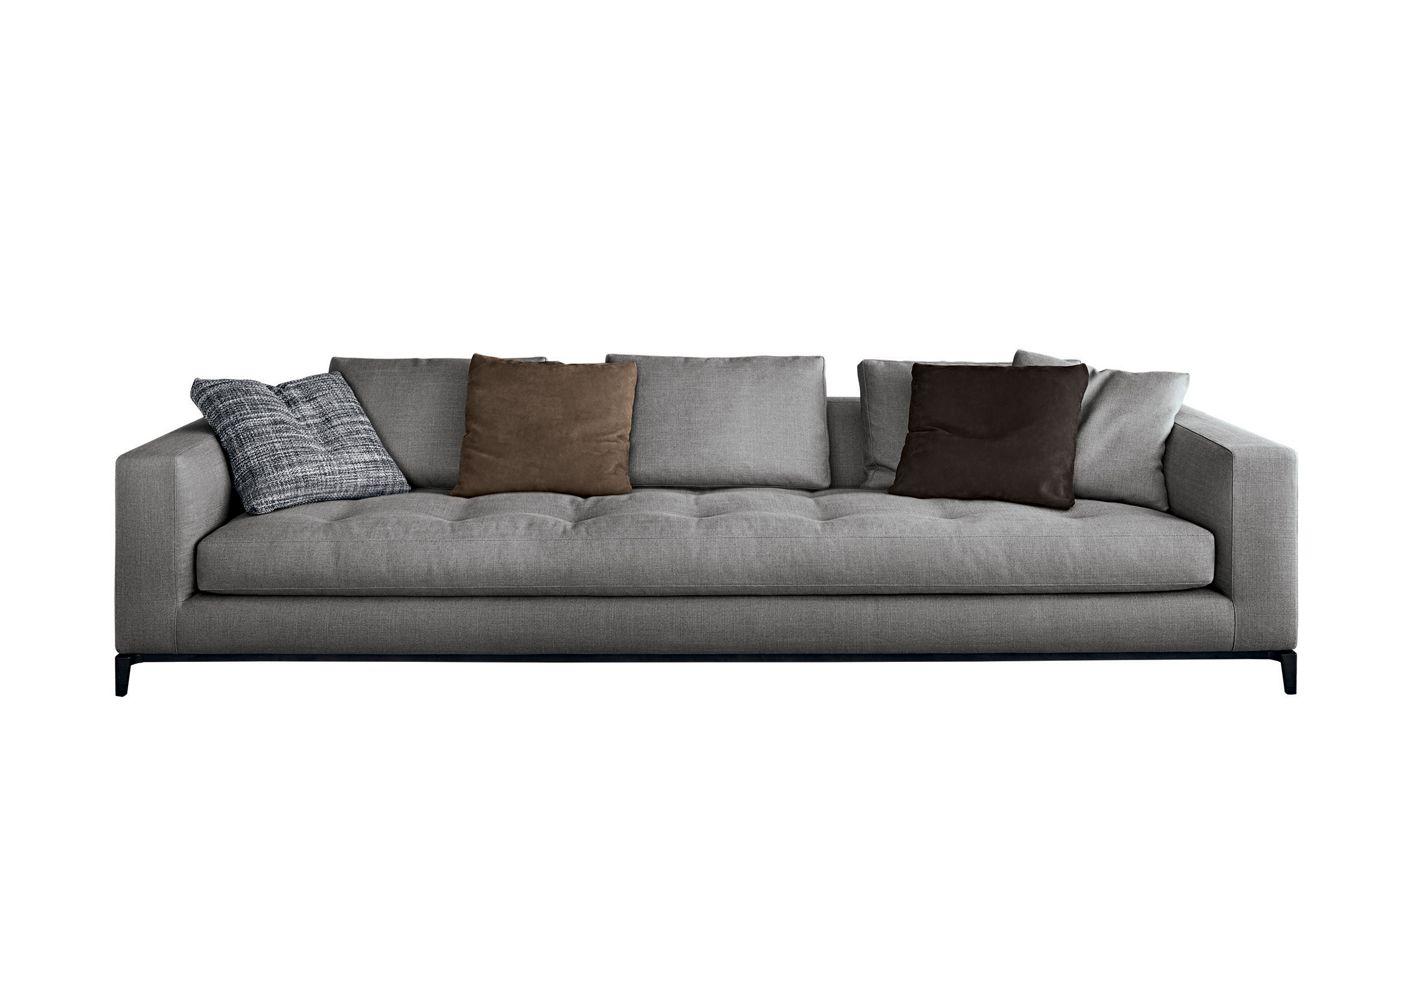 minotti andersen sofa - Google Search | Sofa | Pinterest